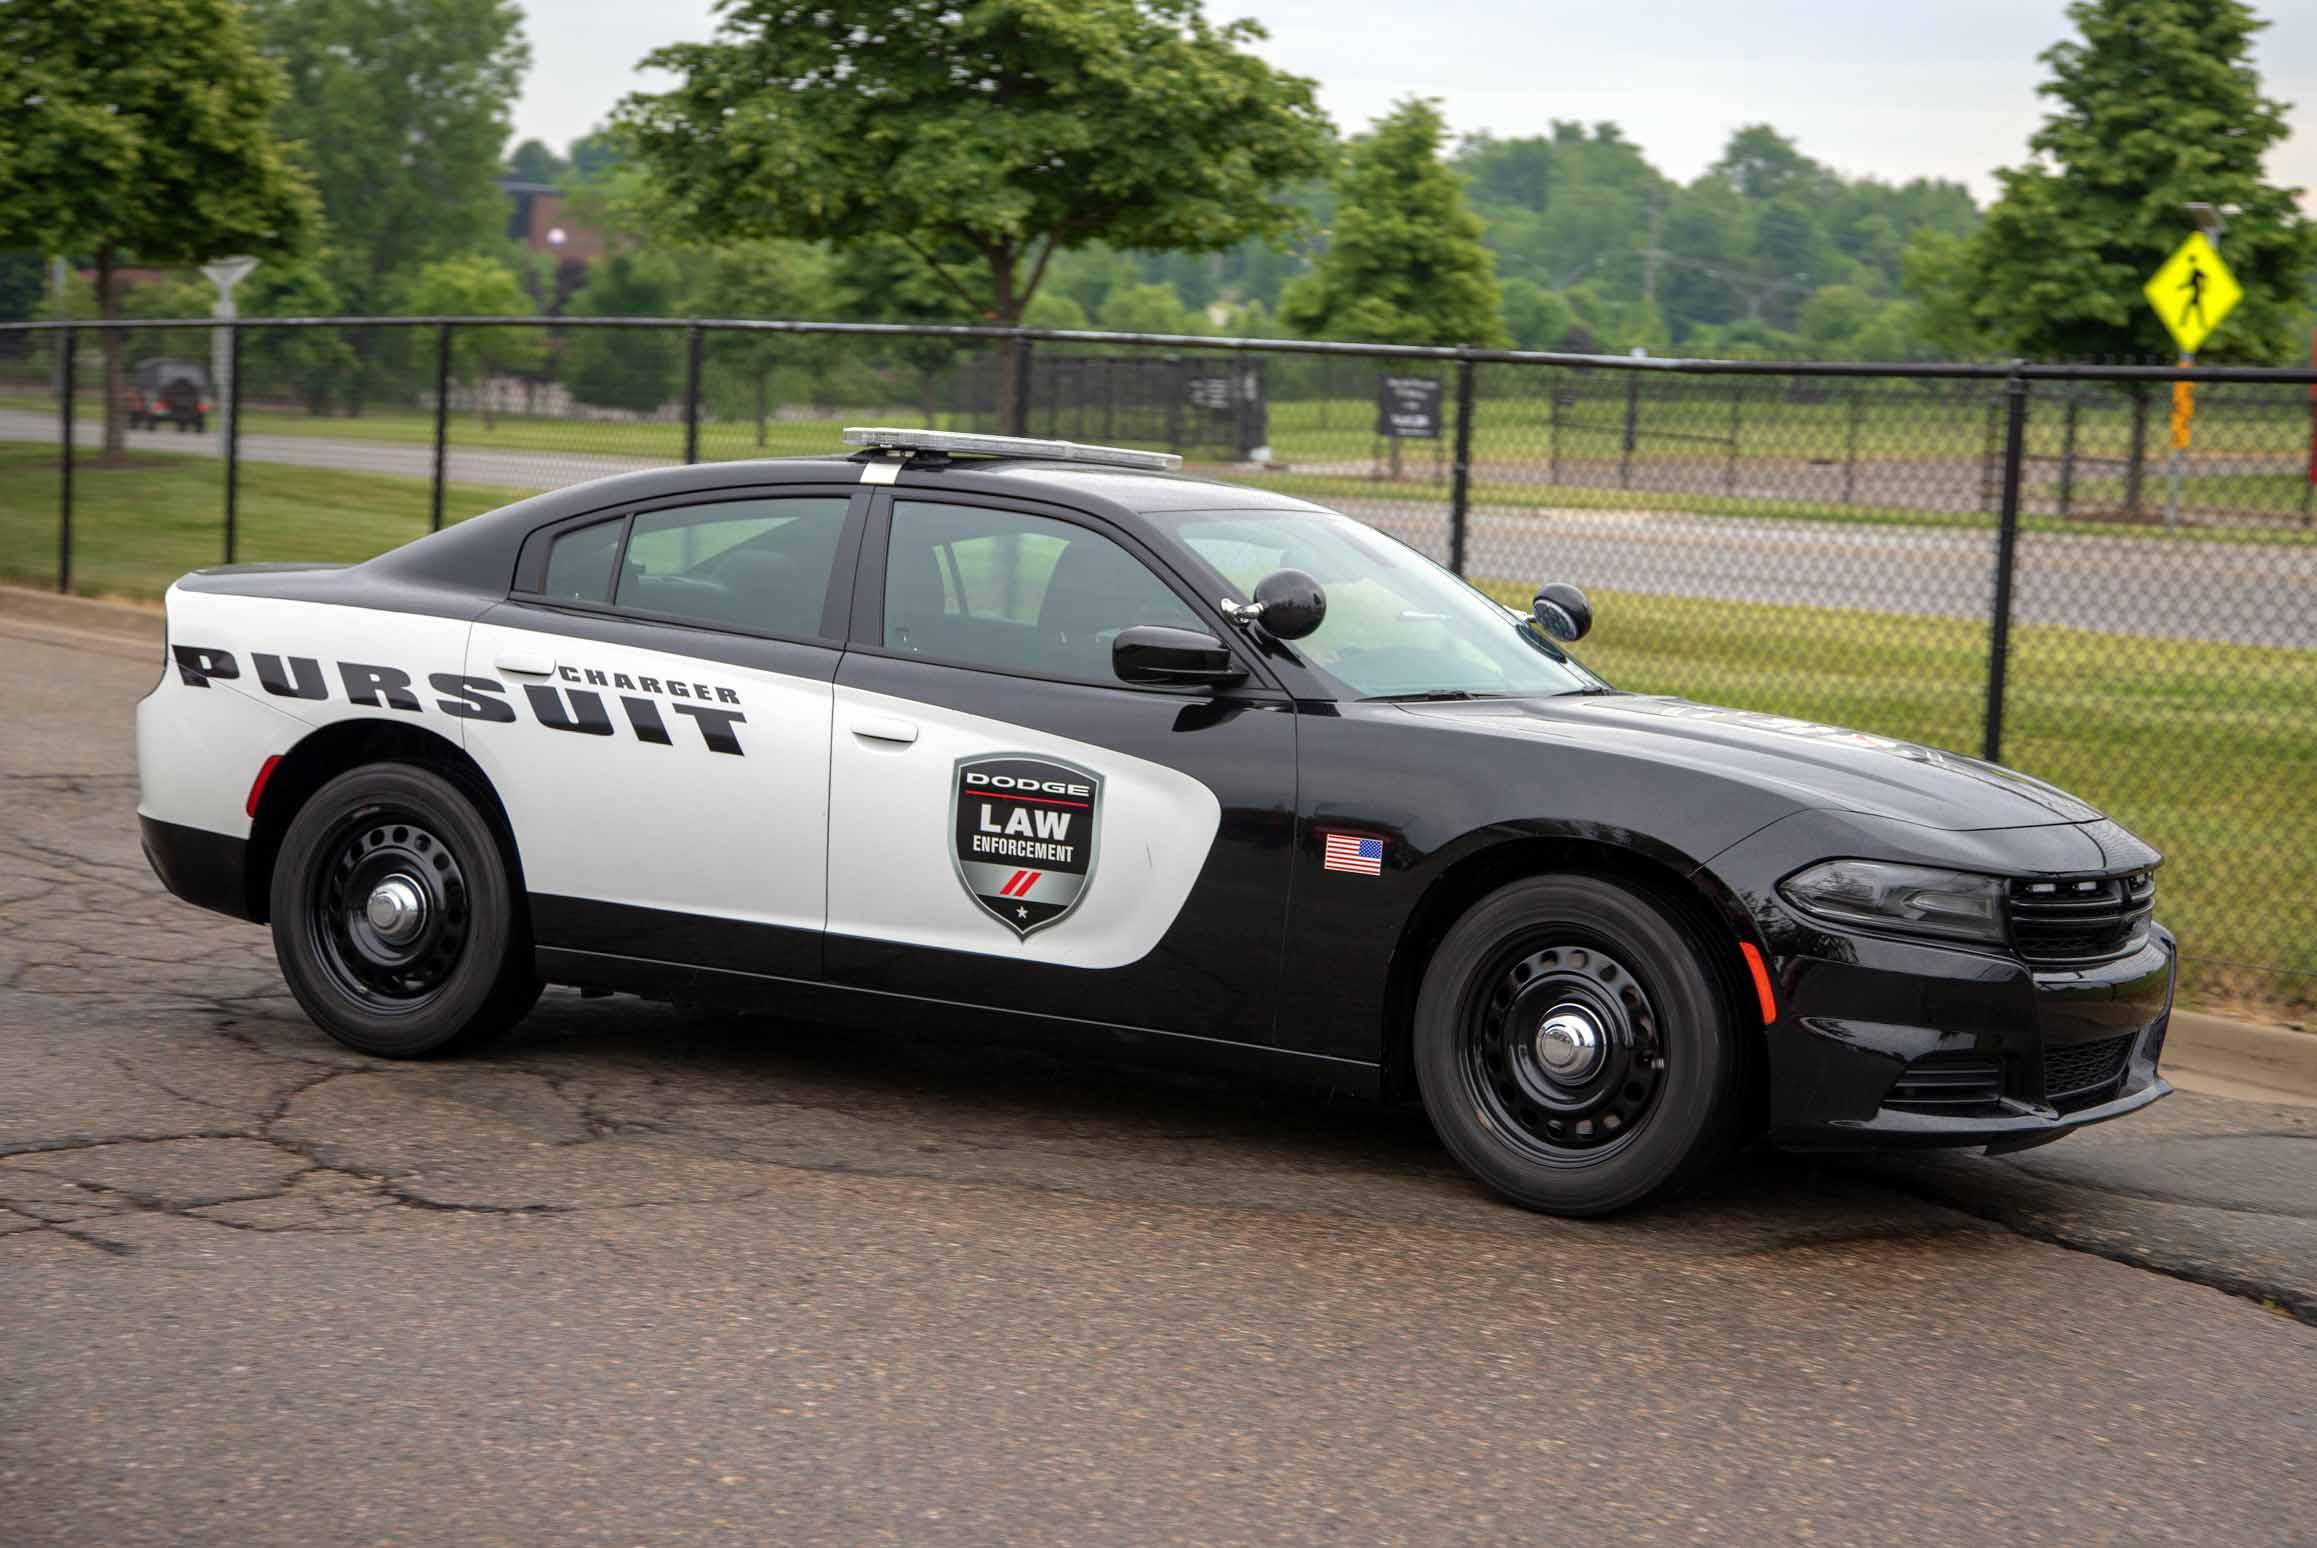 Dodge Charger Police Car >> Dodge Charger Pursuit Gets Minor Improvements For 2019 Mopar Insiders